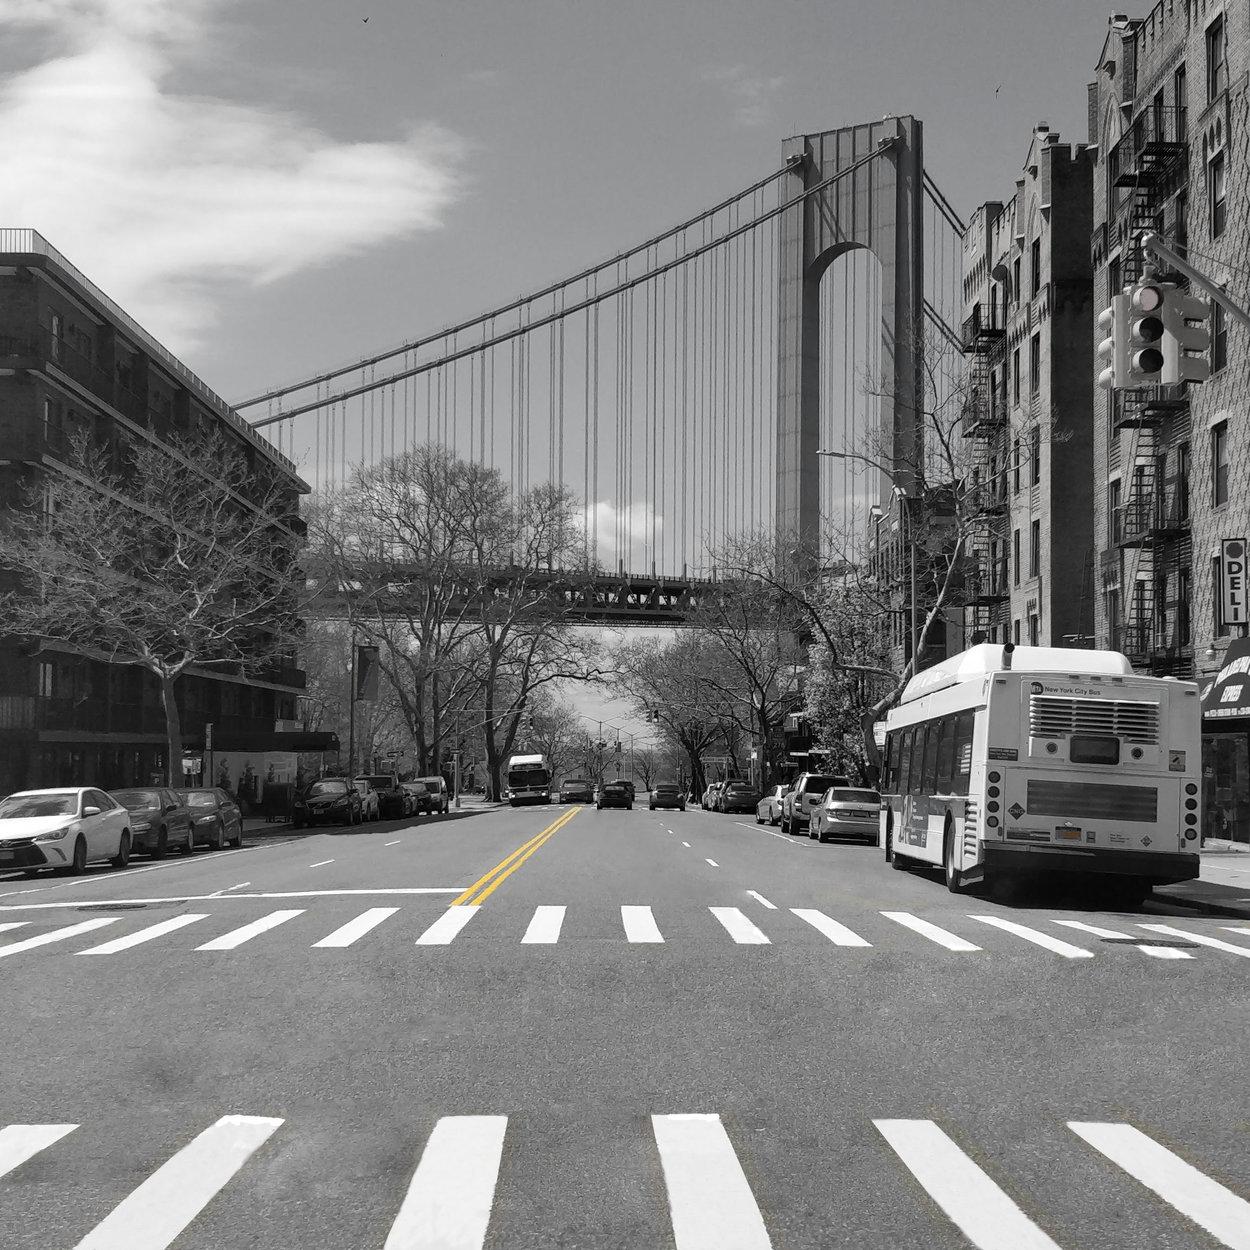 crosswalk_BW.jpg